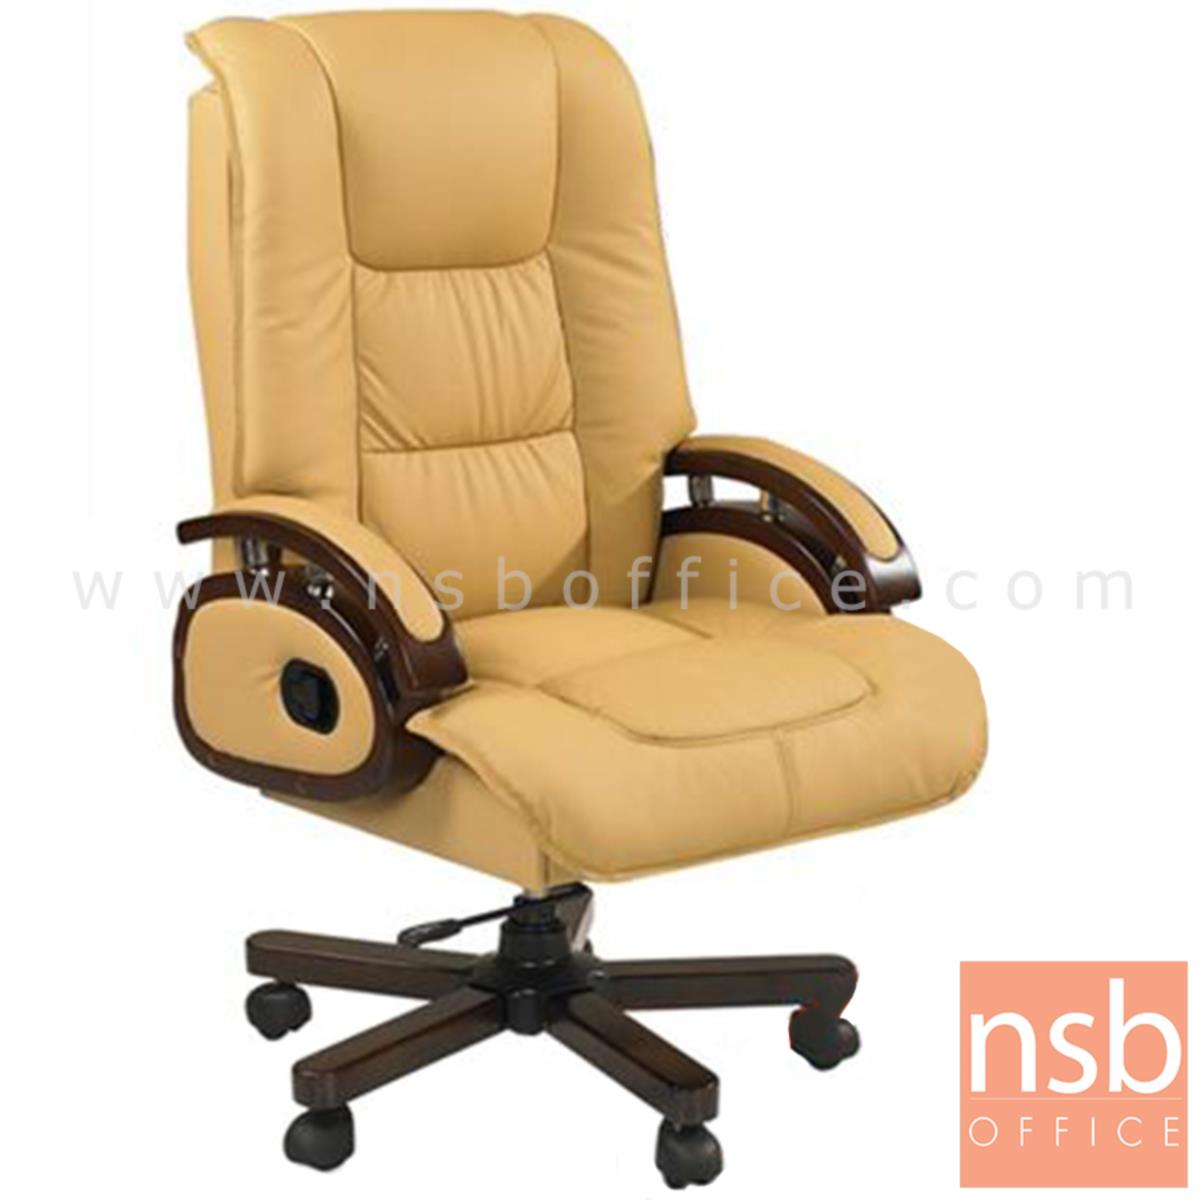 B25A033:เก้าอี้ผู้บริหารหนัง PU รุ่น Lanter (แลนเทอร์)  โช๊คแก๊ส ขาไม้